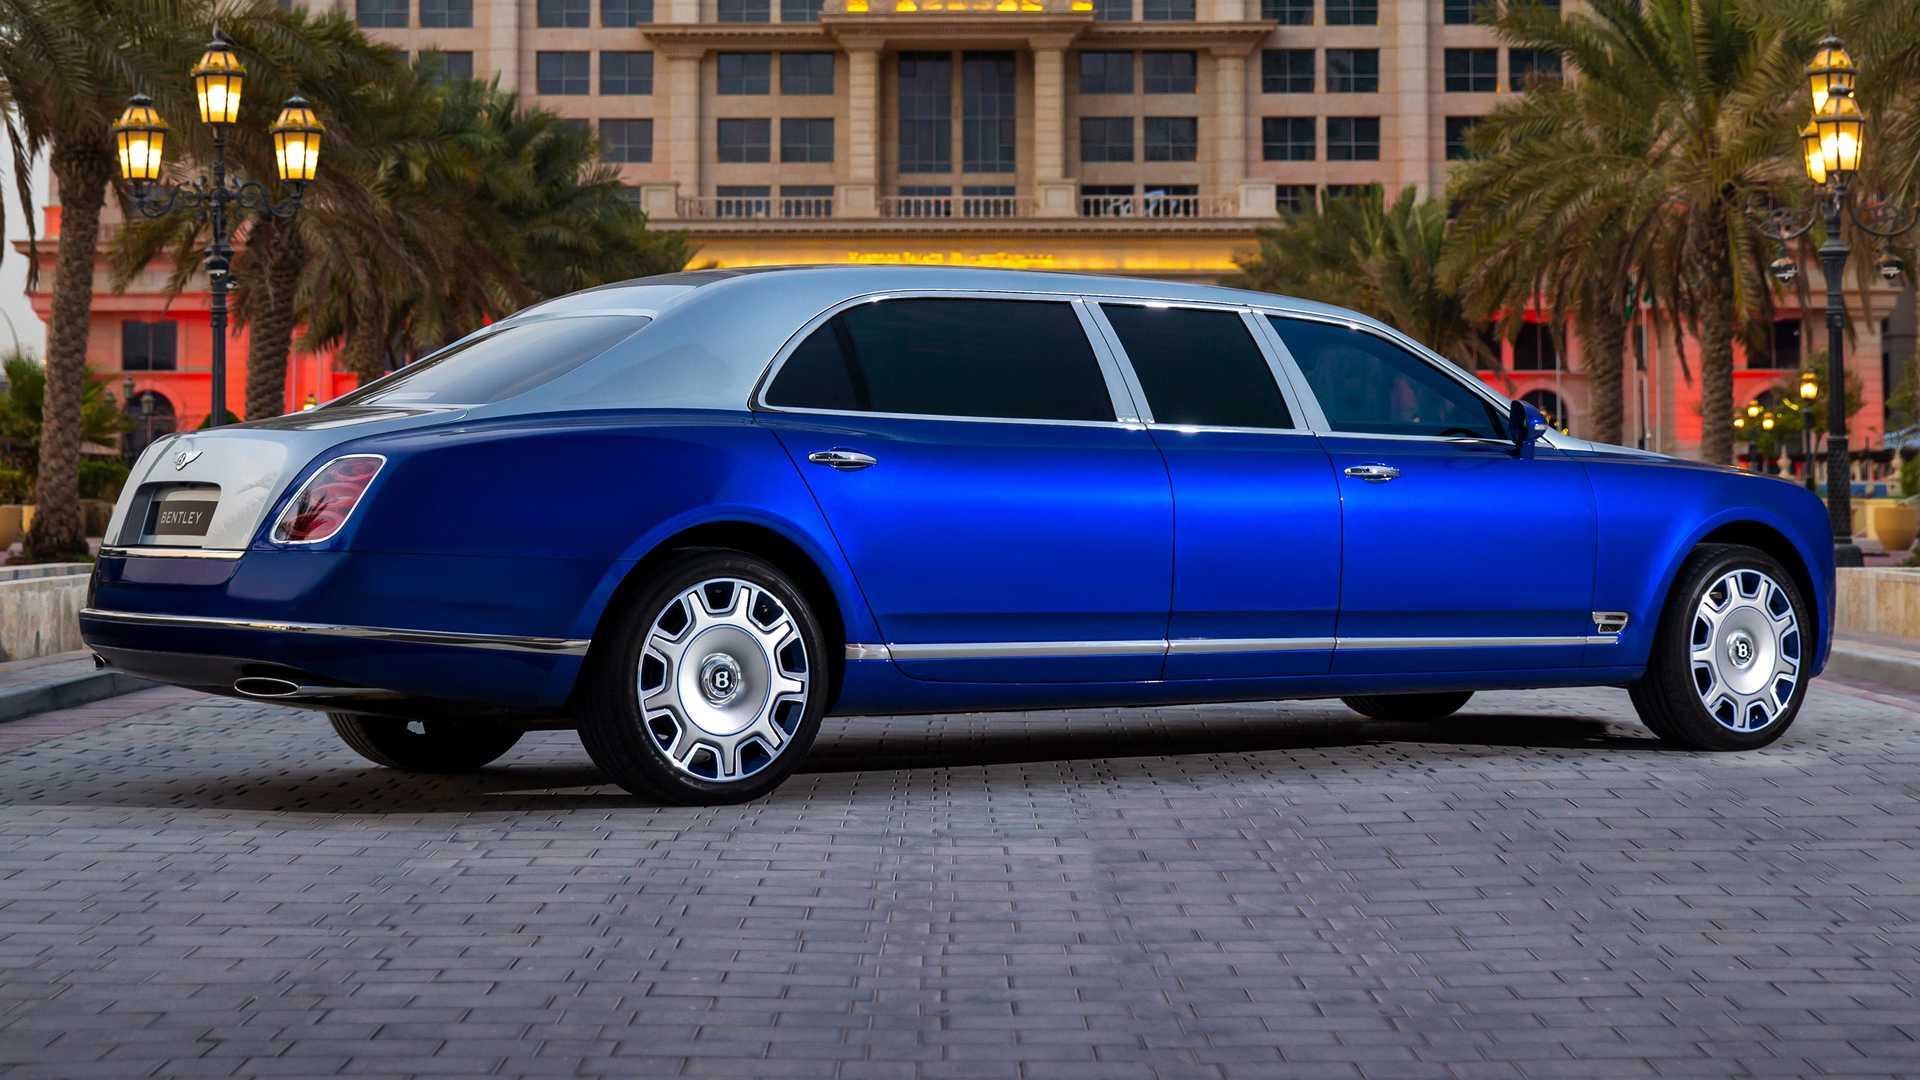 Bentley-Mulsanne-Grand-Limousine-by-Mulliner-2